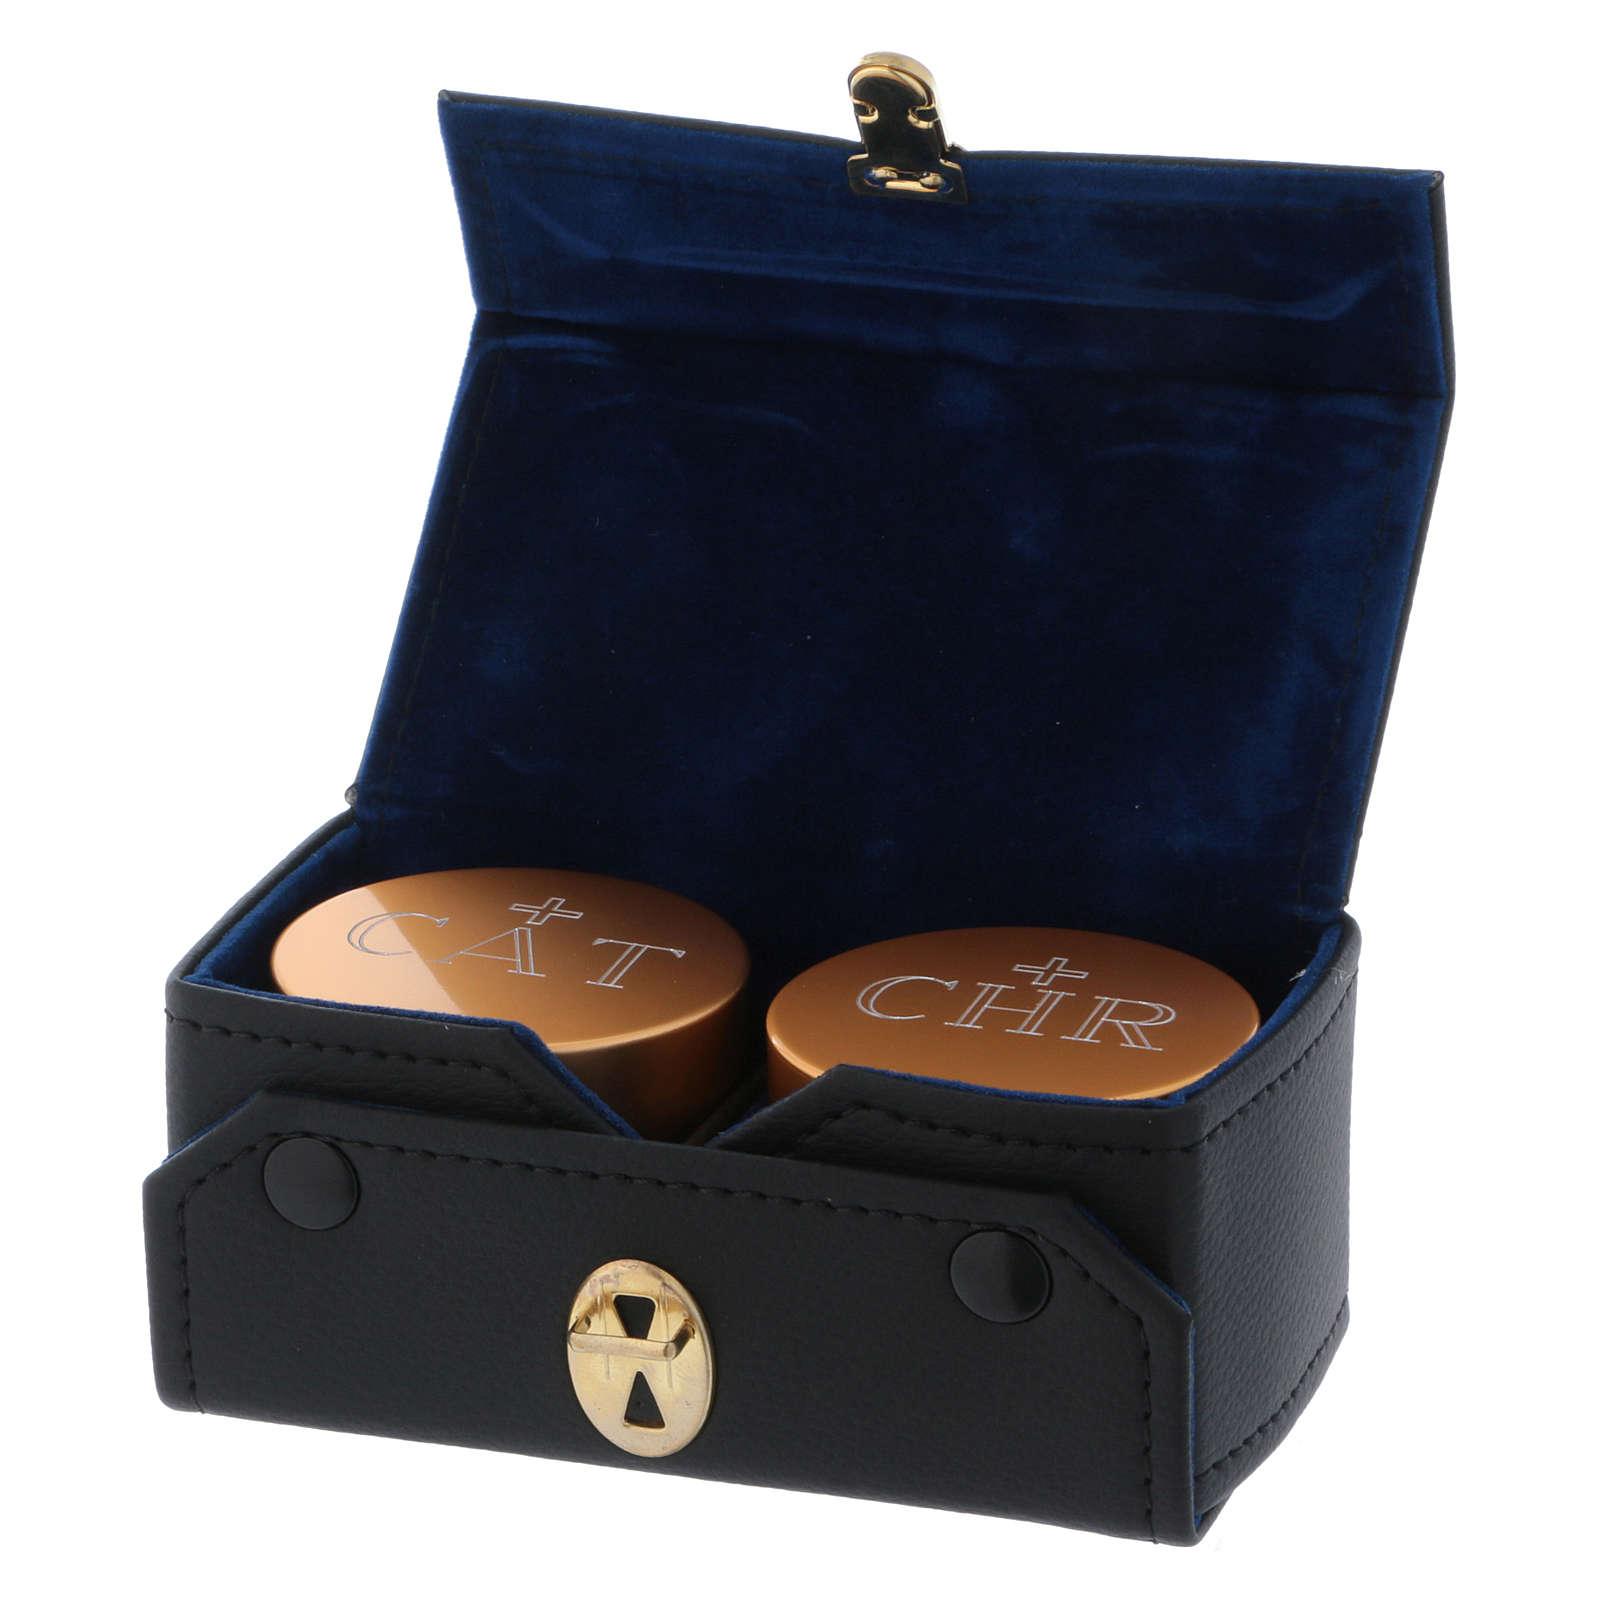 Estuche retangular con dos frascos para santos óleos de aluminio dorado diámetro 5 cm 3